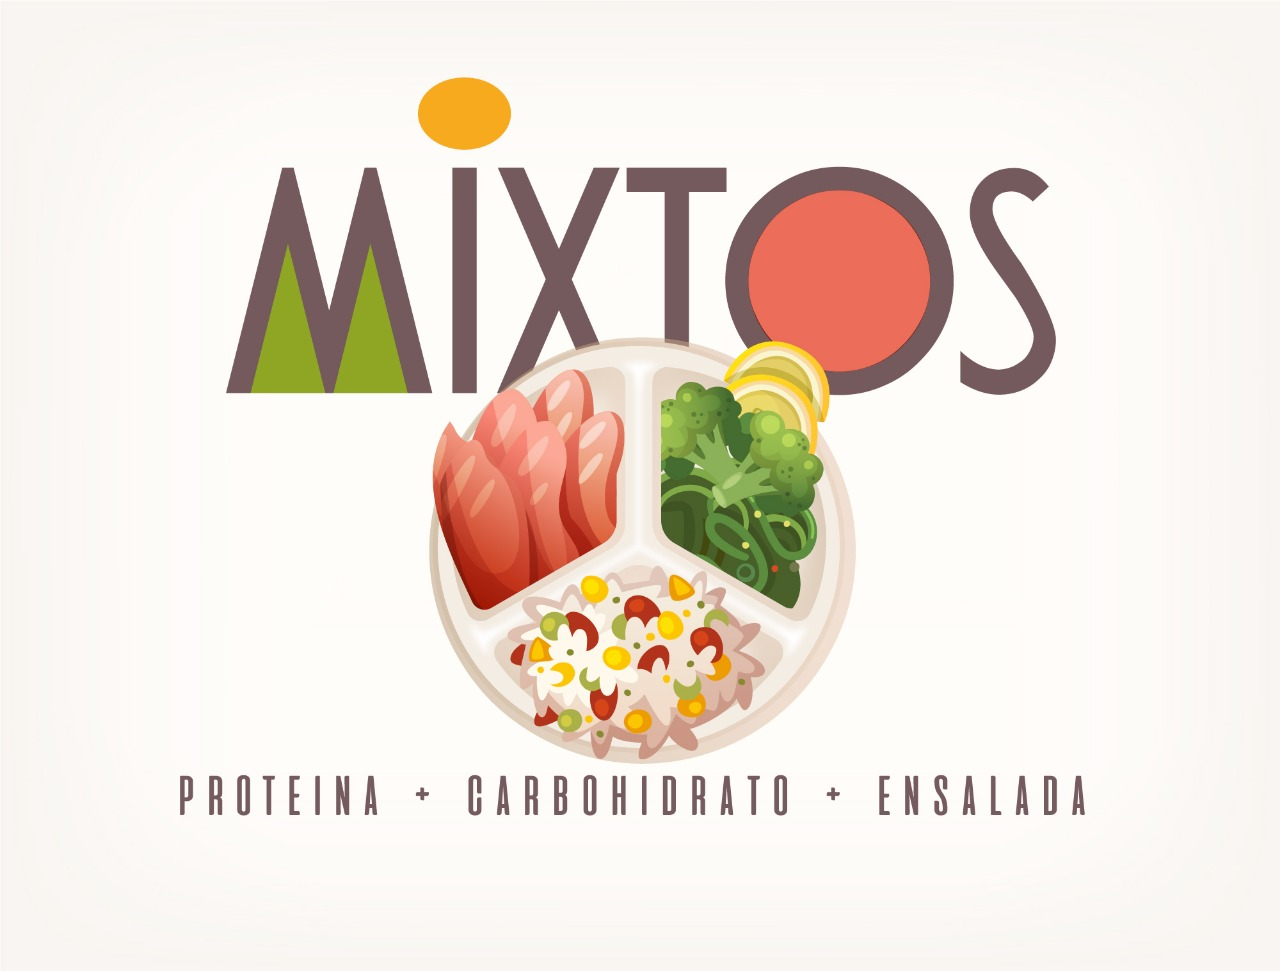 Mixtos - Laureles